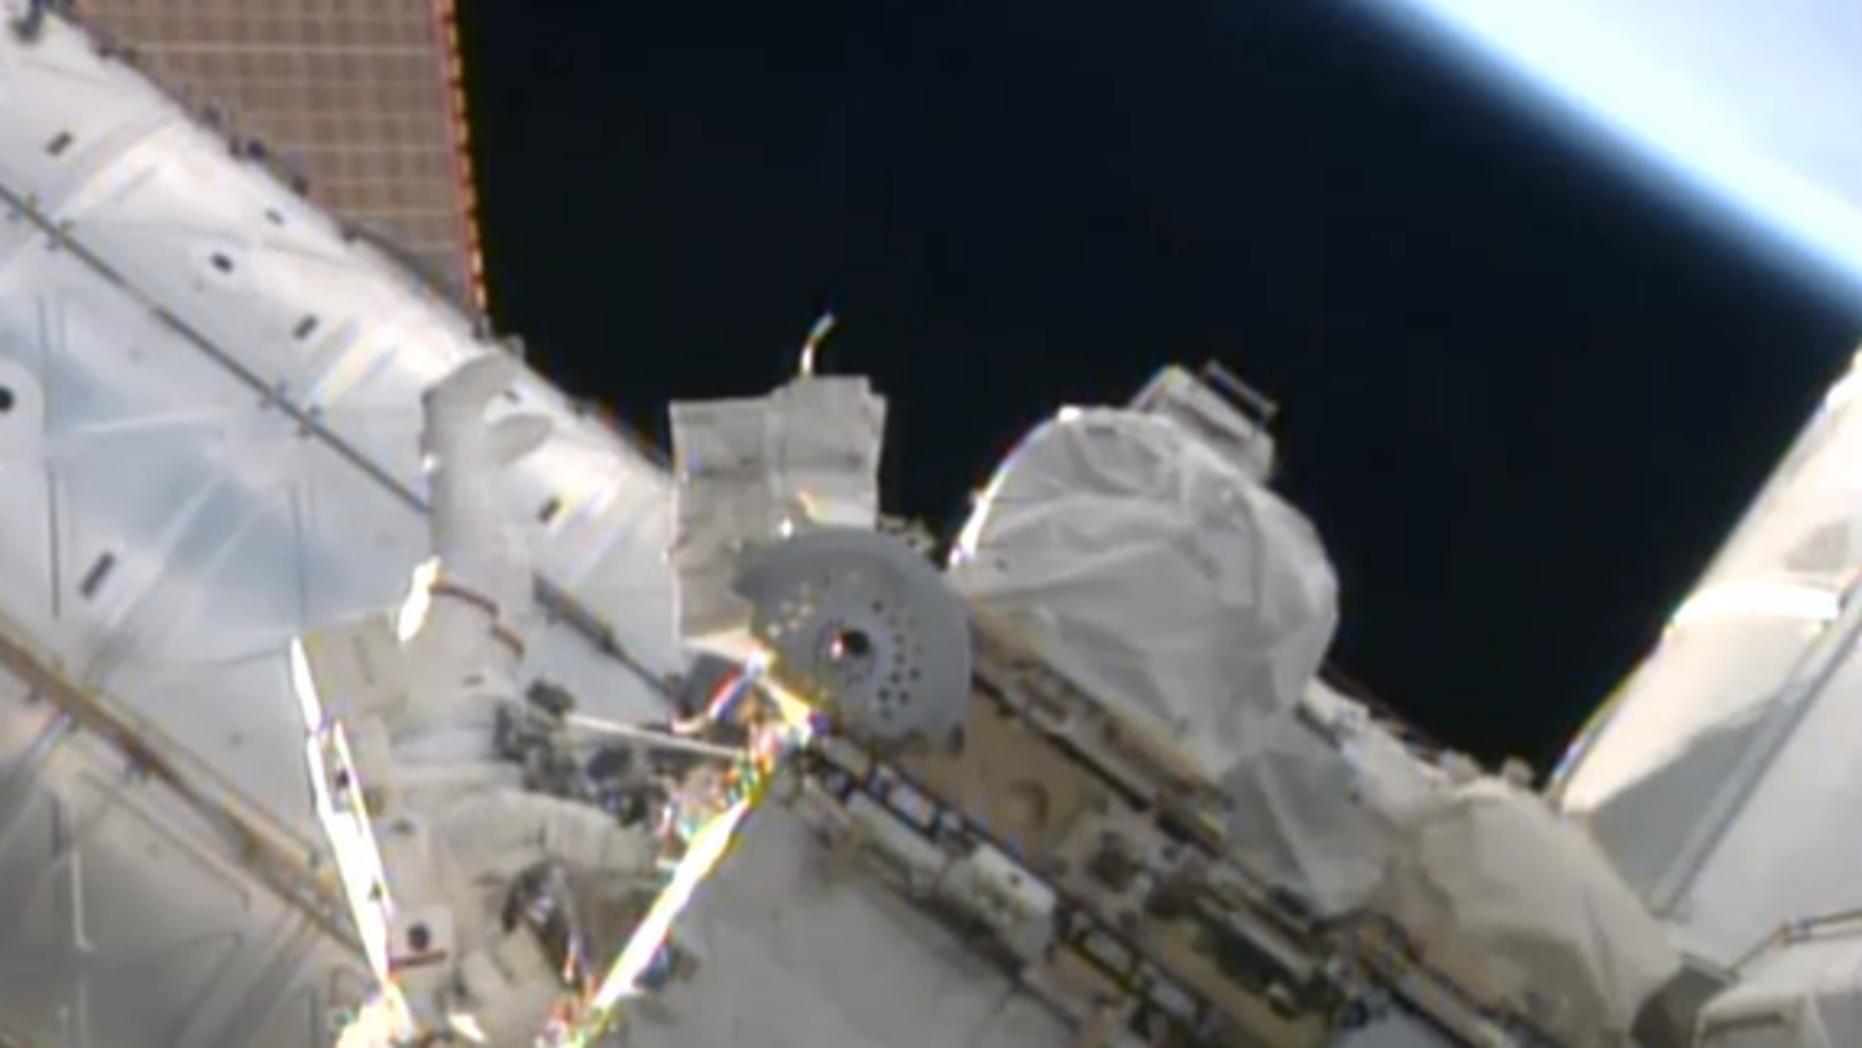 NASA astronaut Reid Wiseman works outside the International Space Station on Oct. 7, 2014.